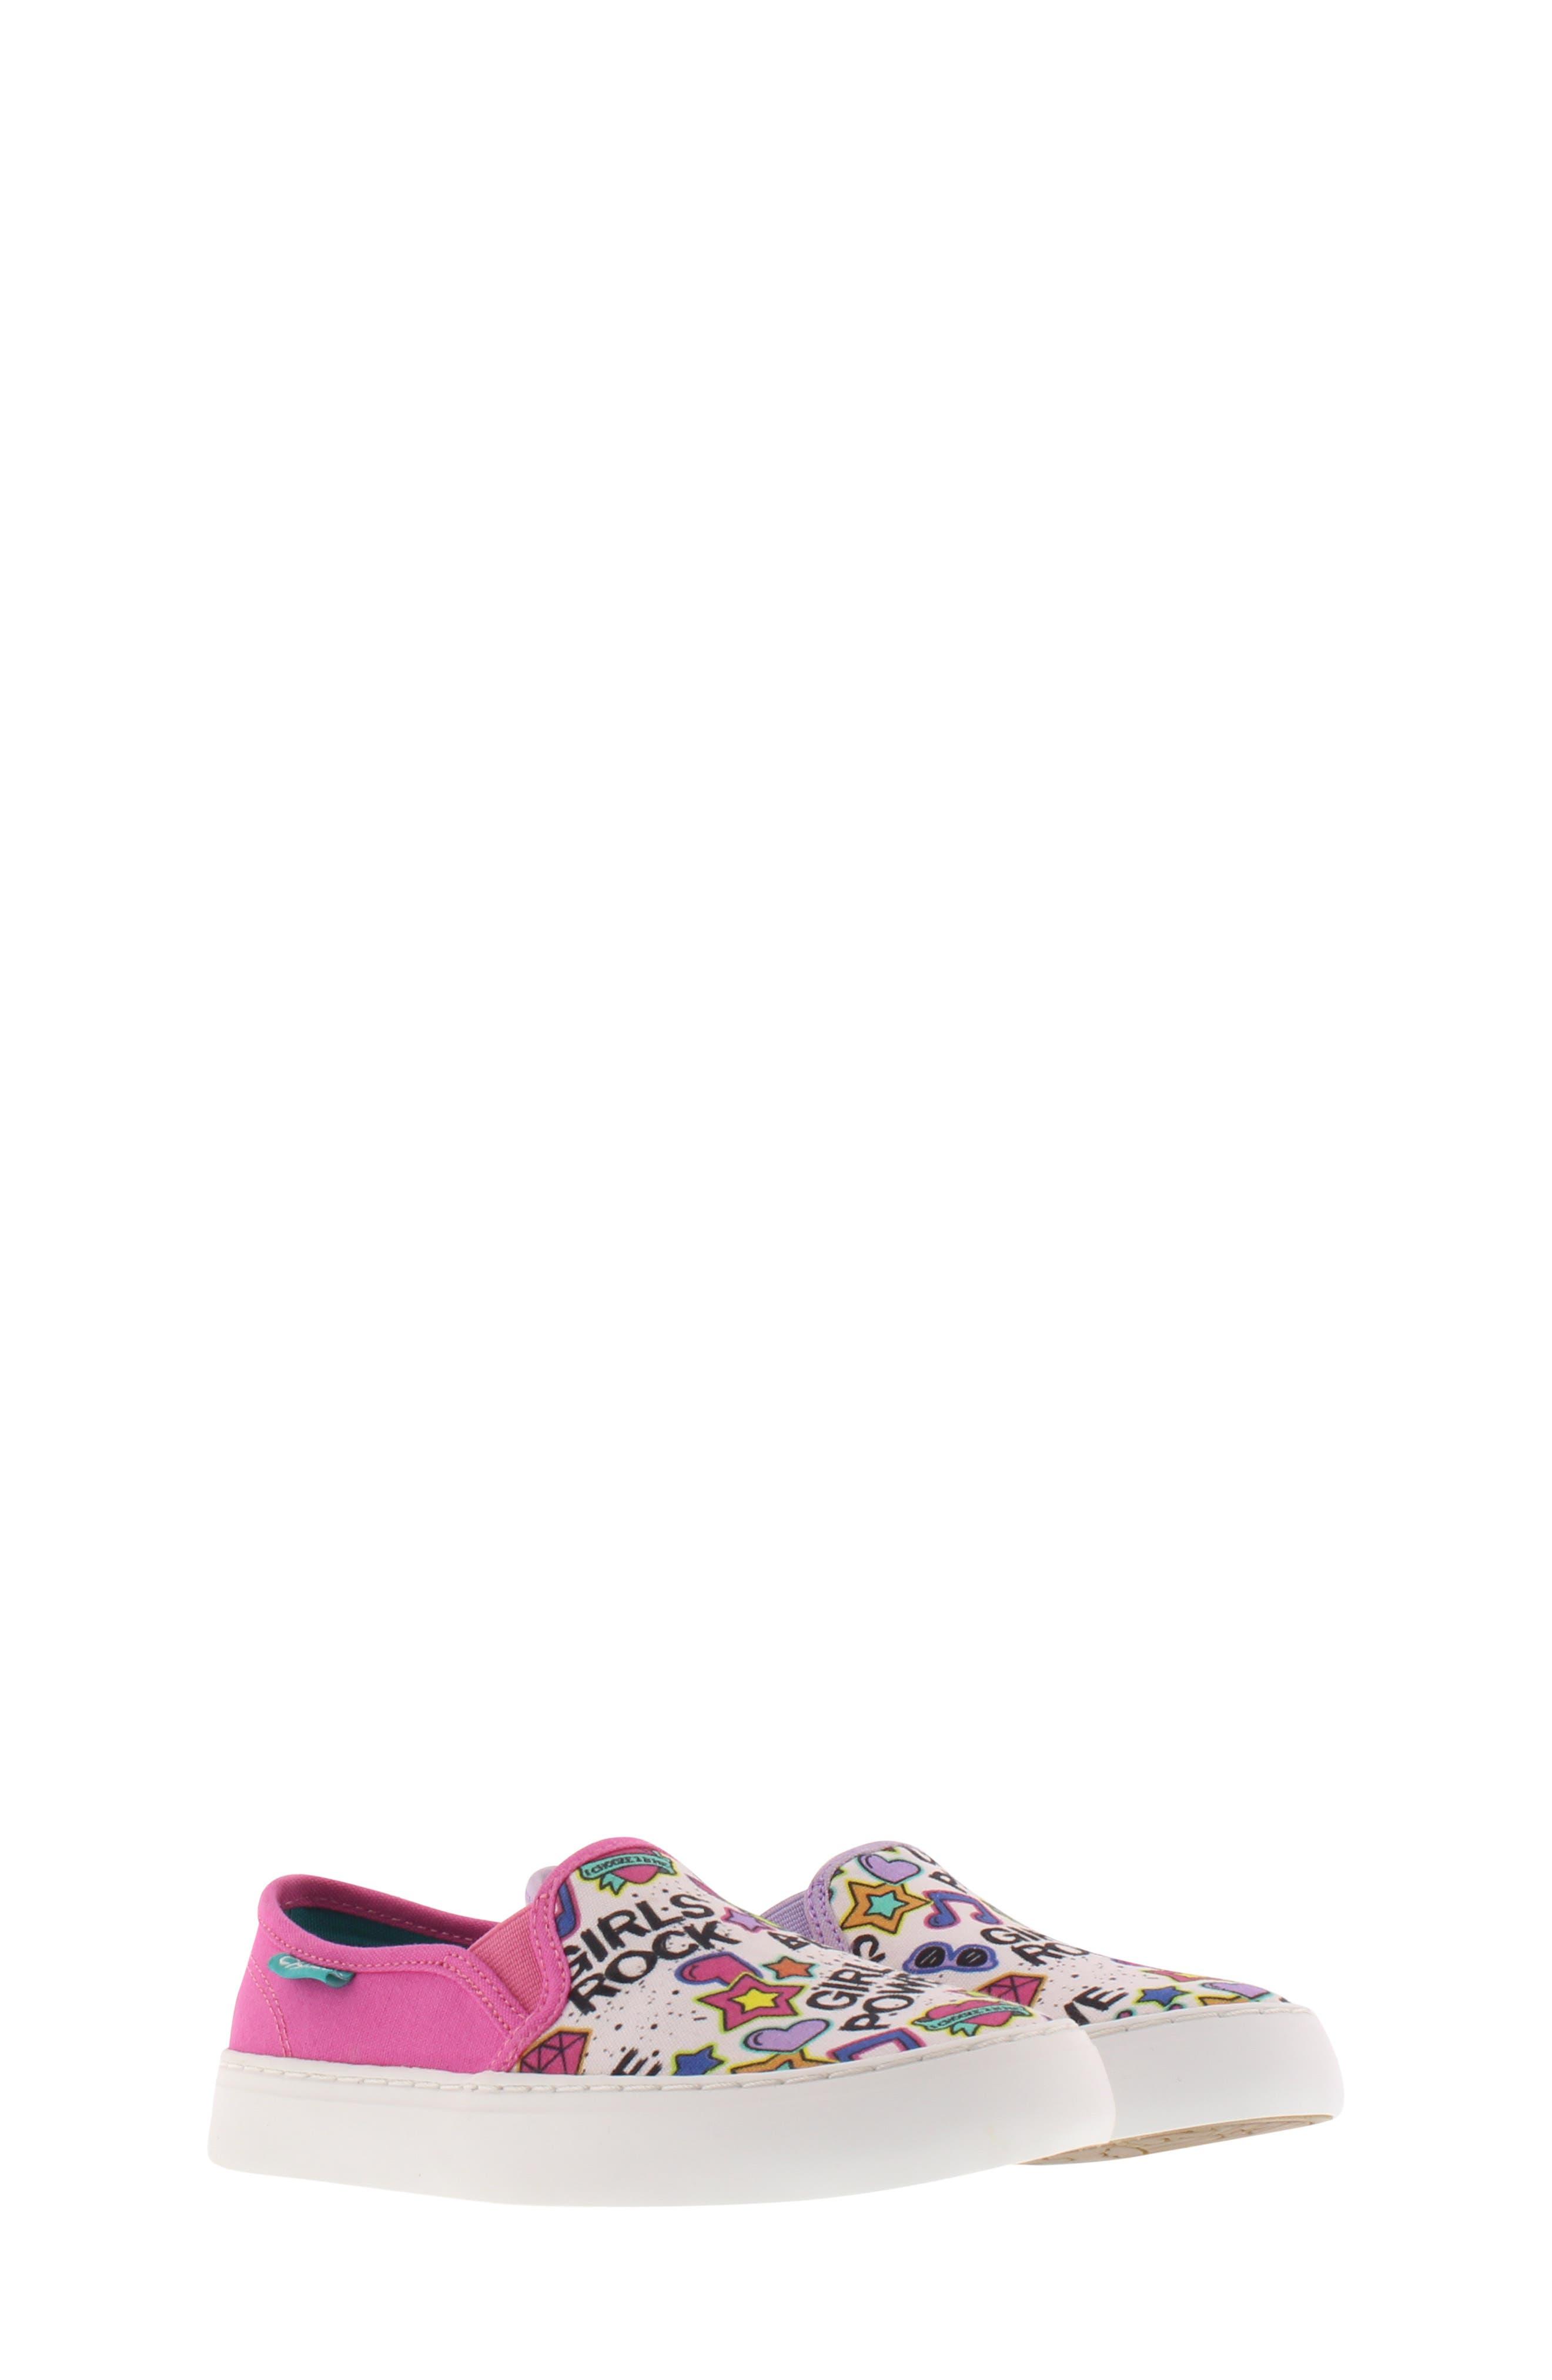 CHOOZE, Move Motion Slip-On Sneaker, Main thumbnail 1, color, PINK LAVENDER